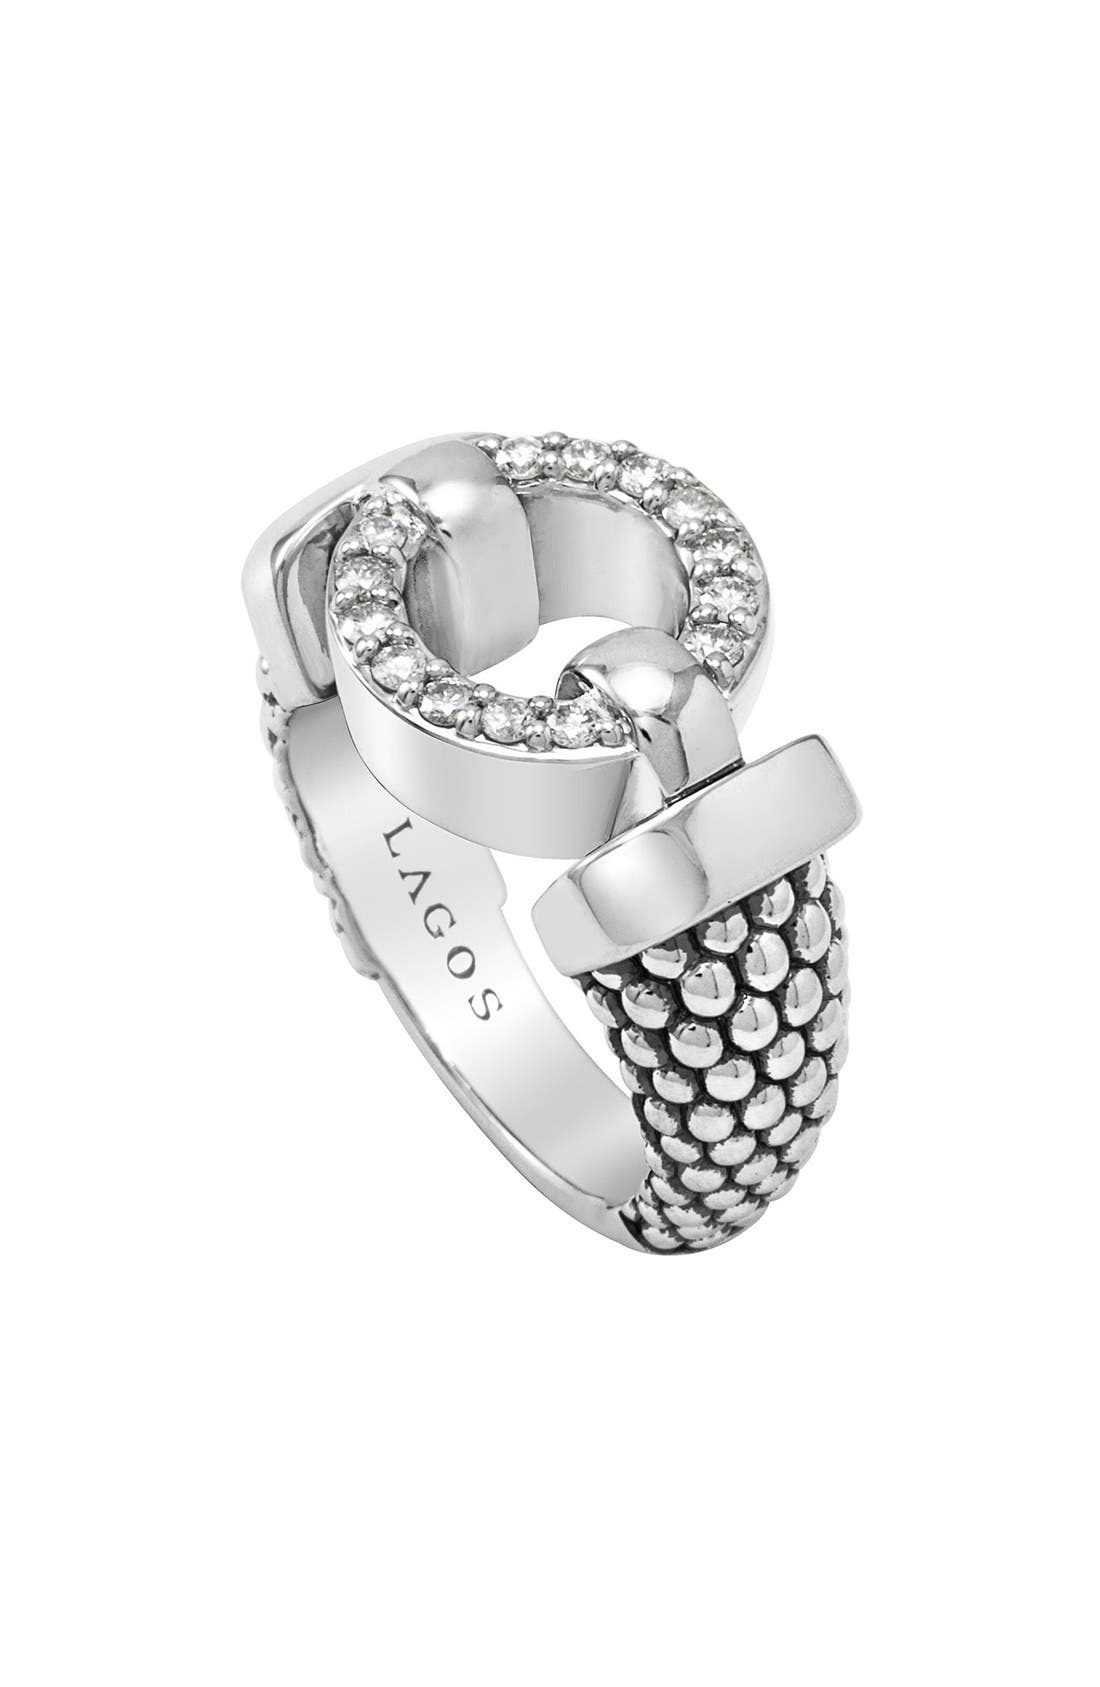 Main Image - LAGOS 'Enso - Circle Game' Diamond Caviar Ring